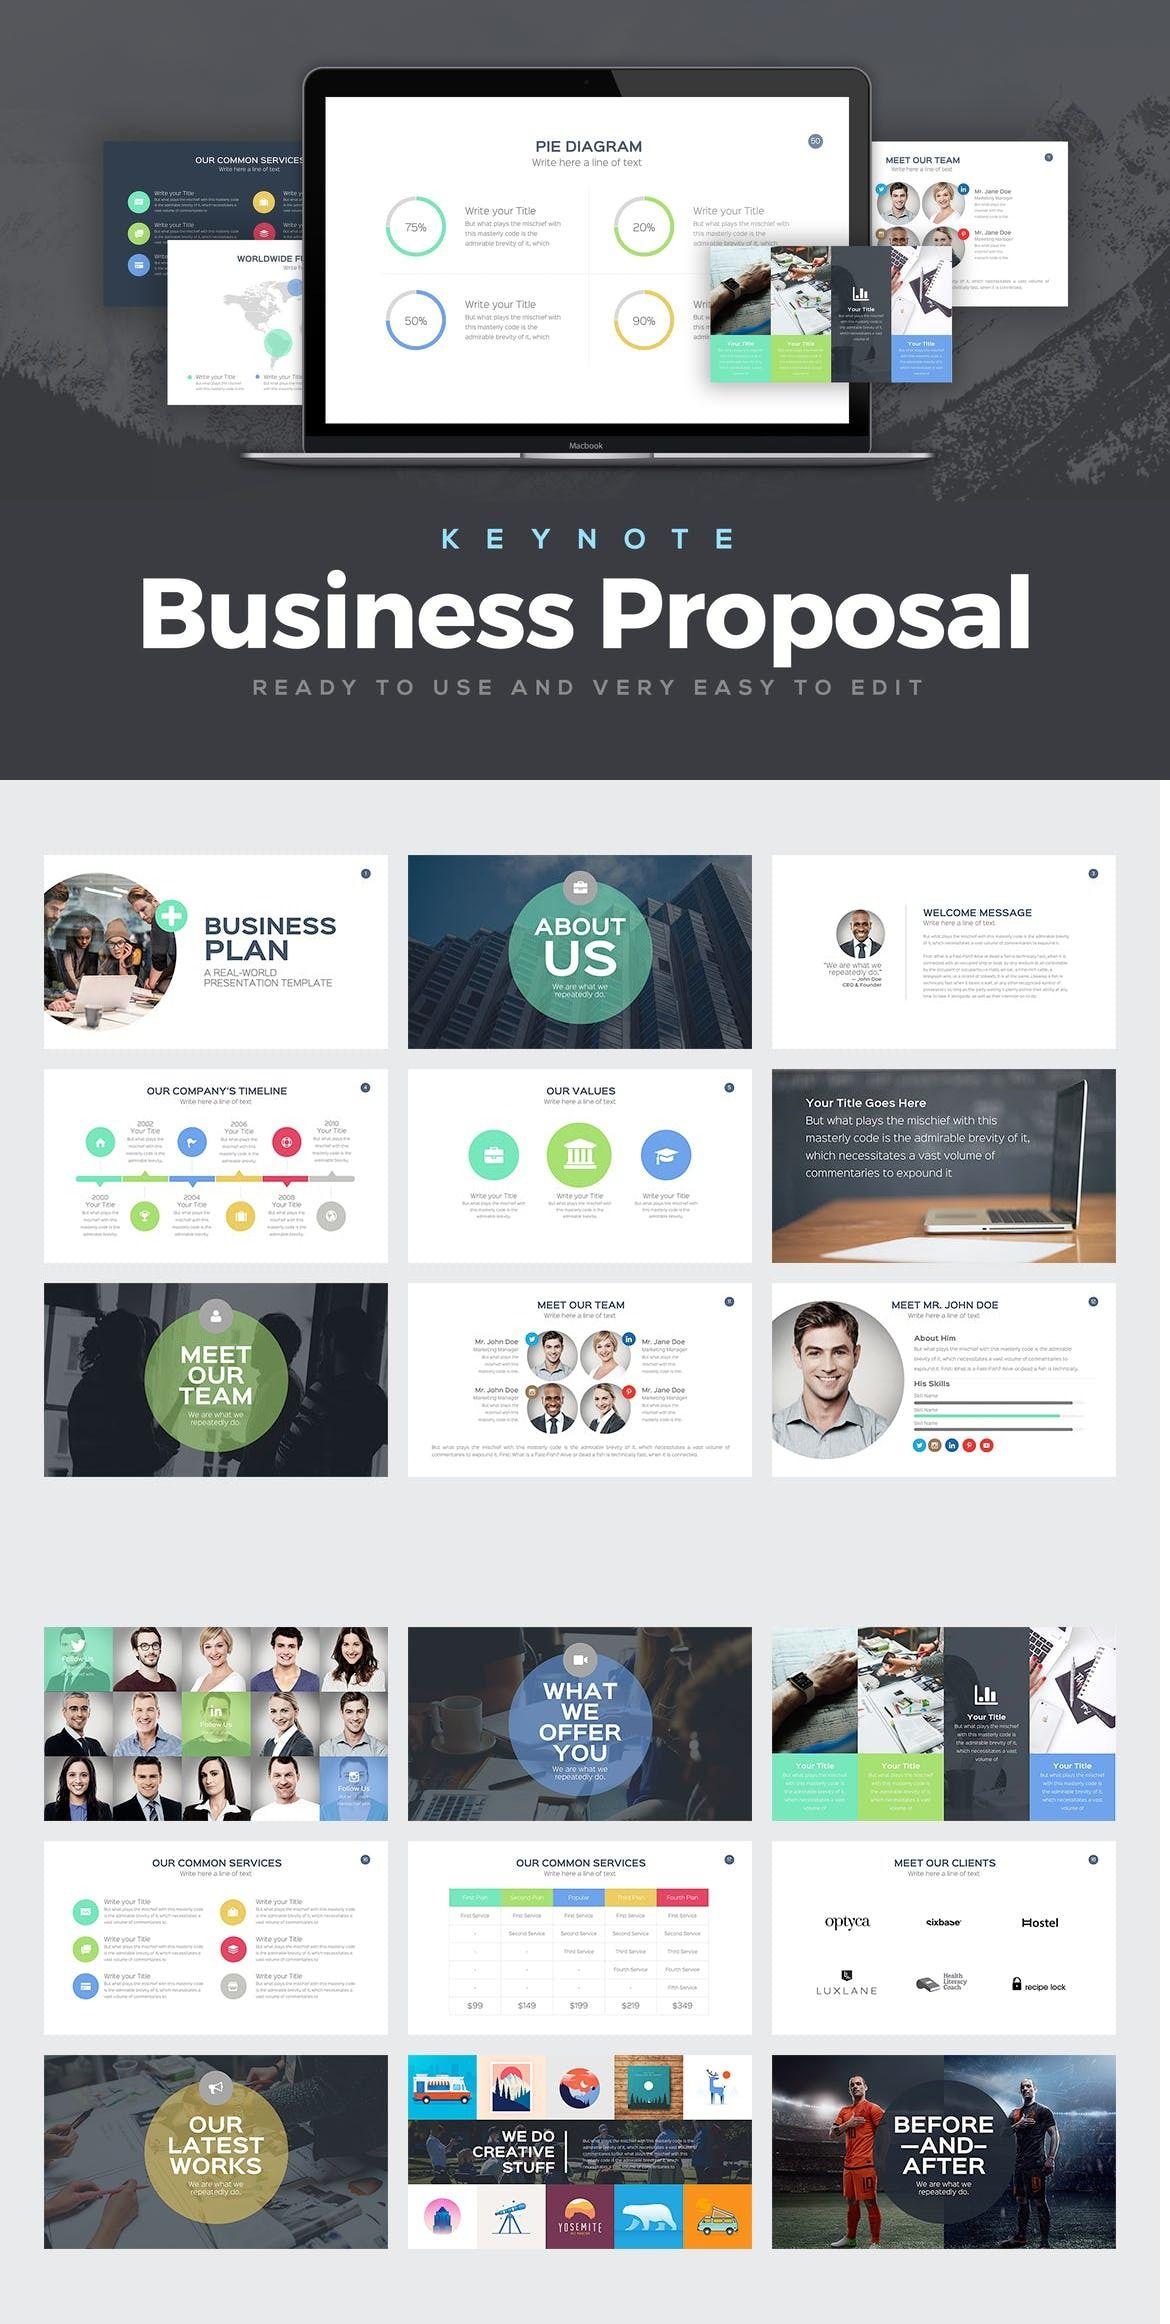 Business Proposal Keynote Template Keynote Business Pitch